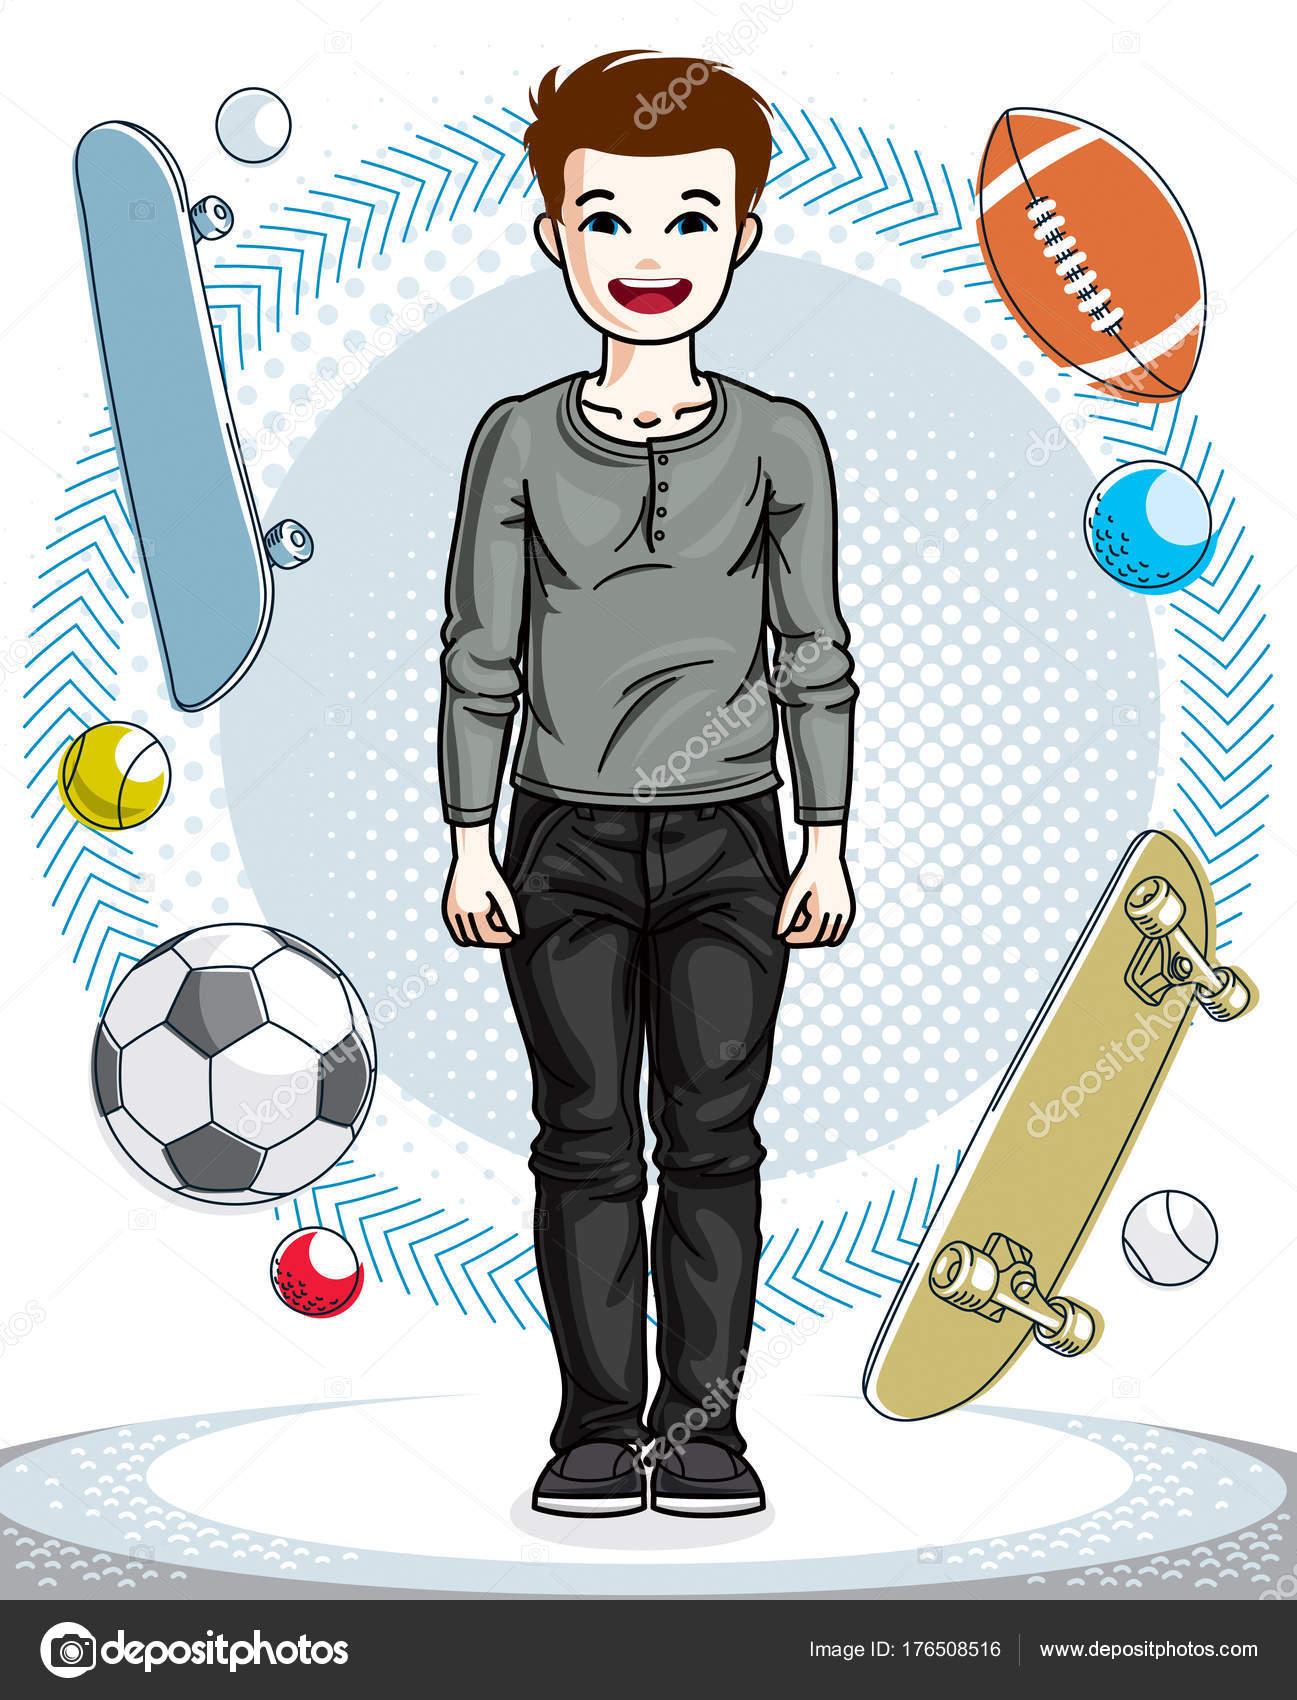 c22657f8a2e Γλυκό μικρό αγόρι νεαρός έφηβος στέκεται φορούν casual ρούχα. Διανυσματικό  χαρακτήρα. Παιδική ηλικία lifestyle εικόνες clip art — Διάνυσμα με Ostapius